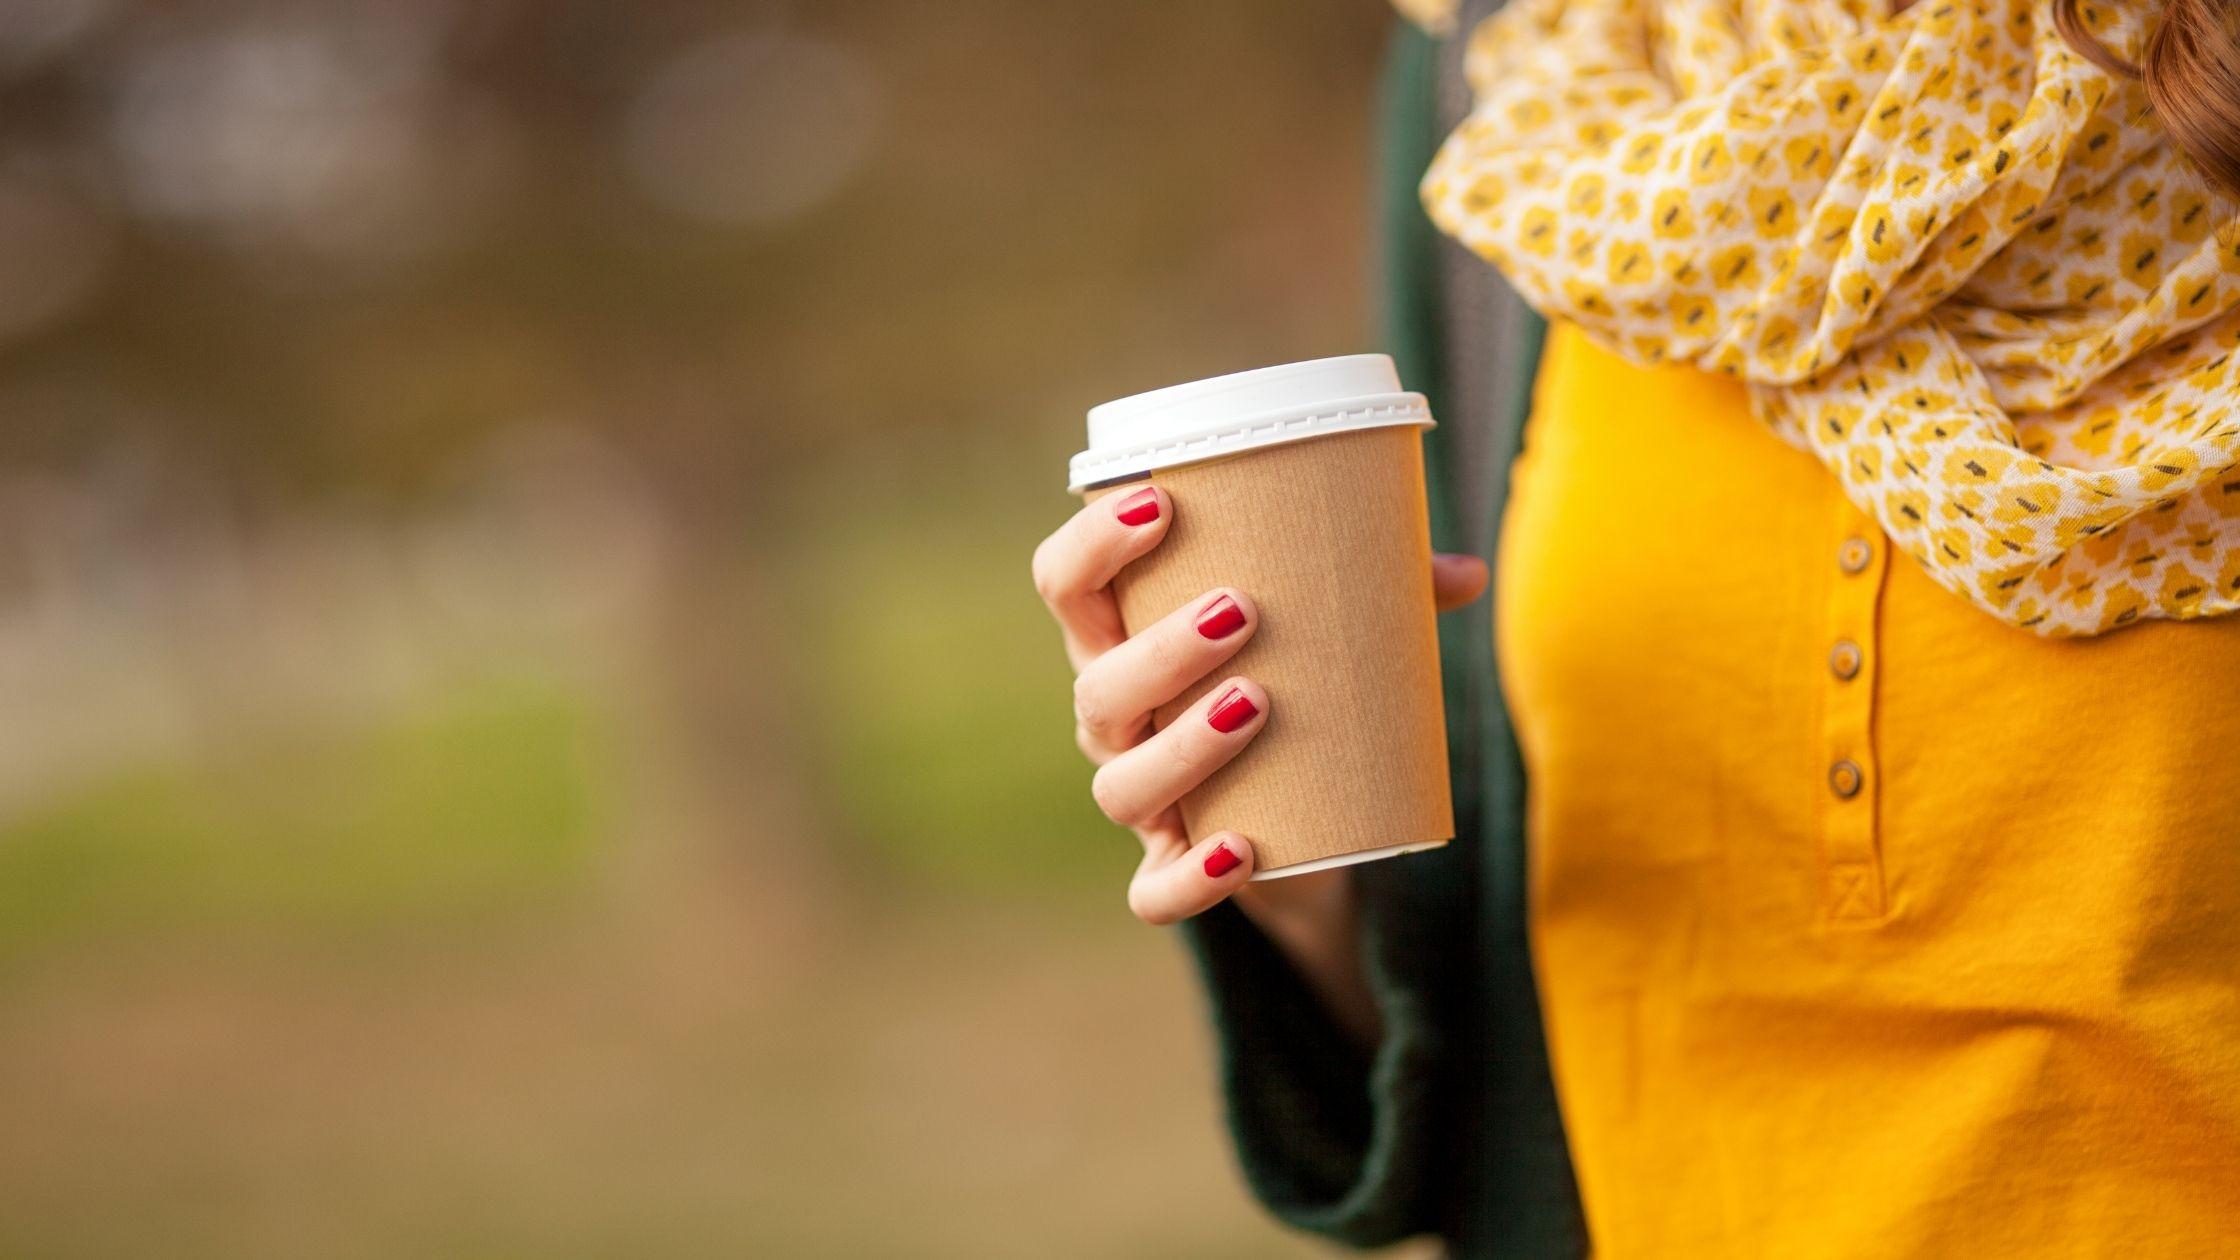 Dure gewoontes - Koffie